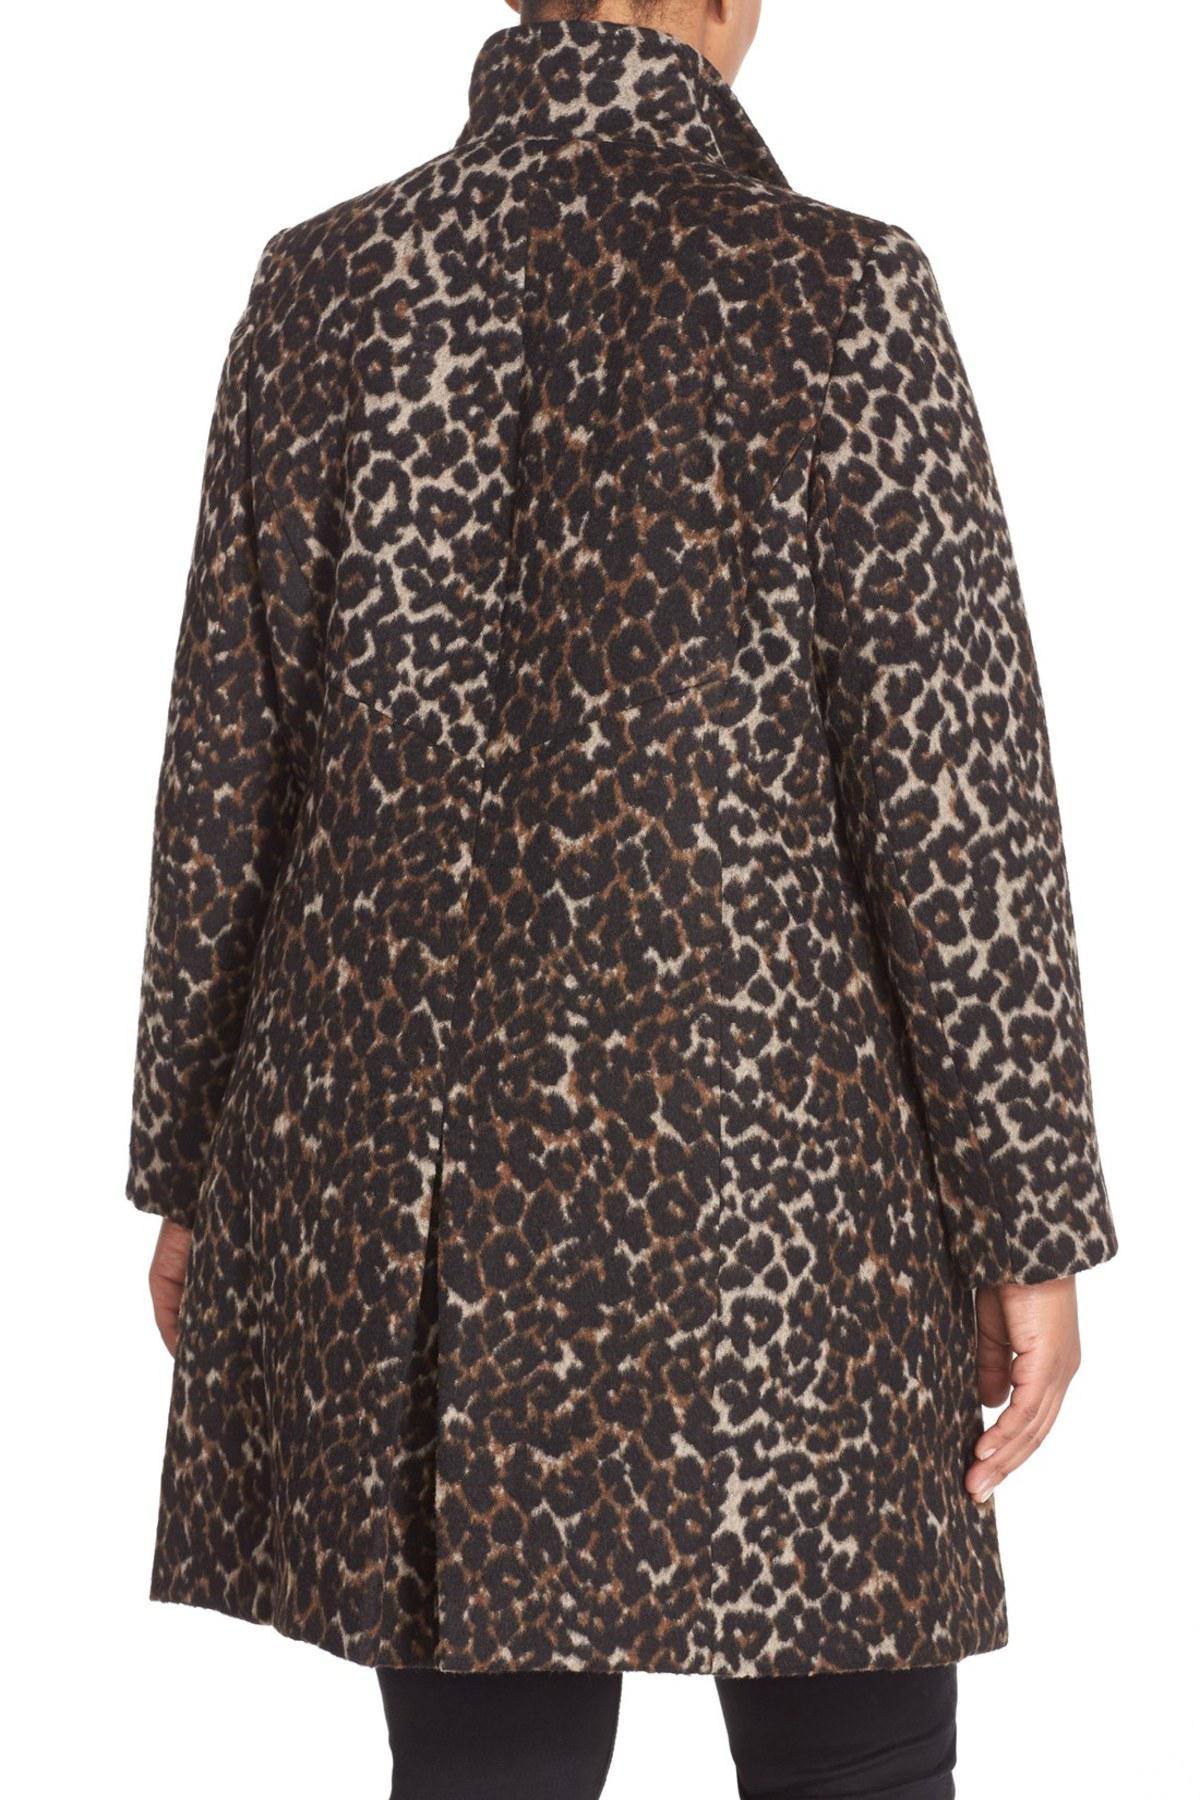 Lyst Via Spiga Leopard Print Stand Collar Coat Plus